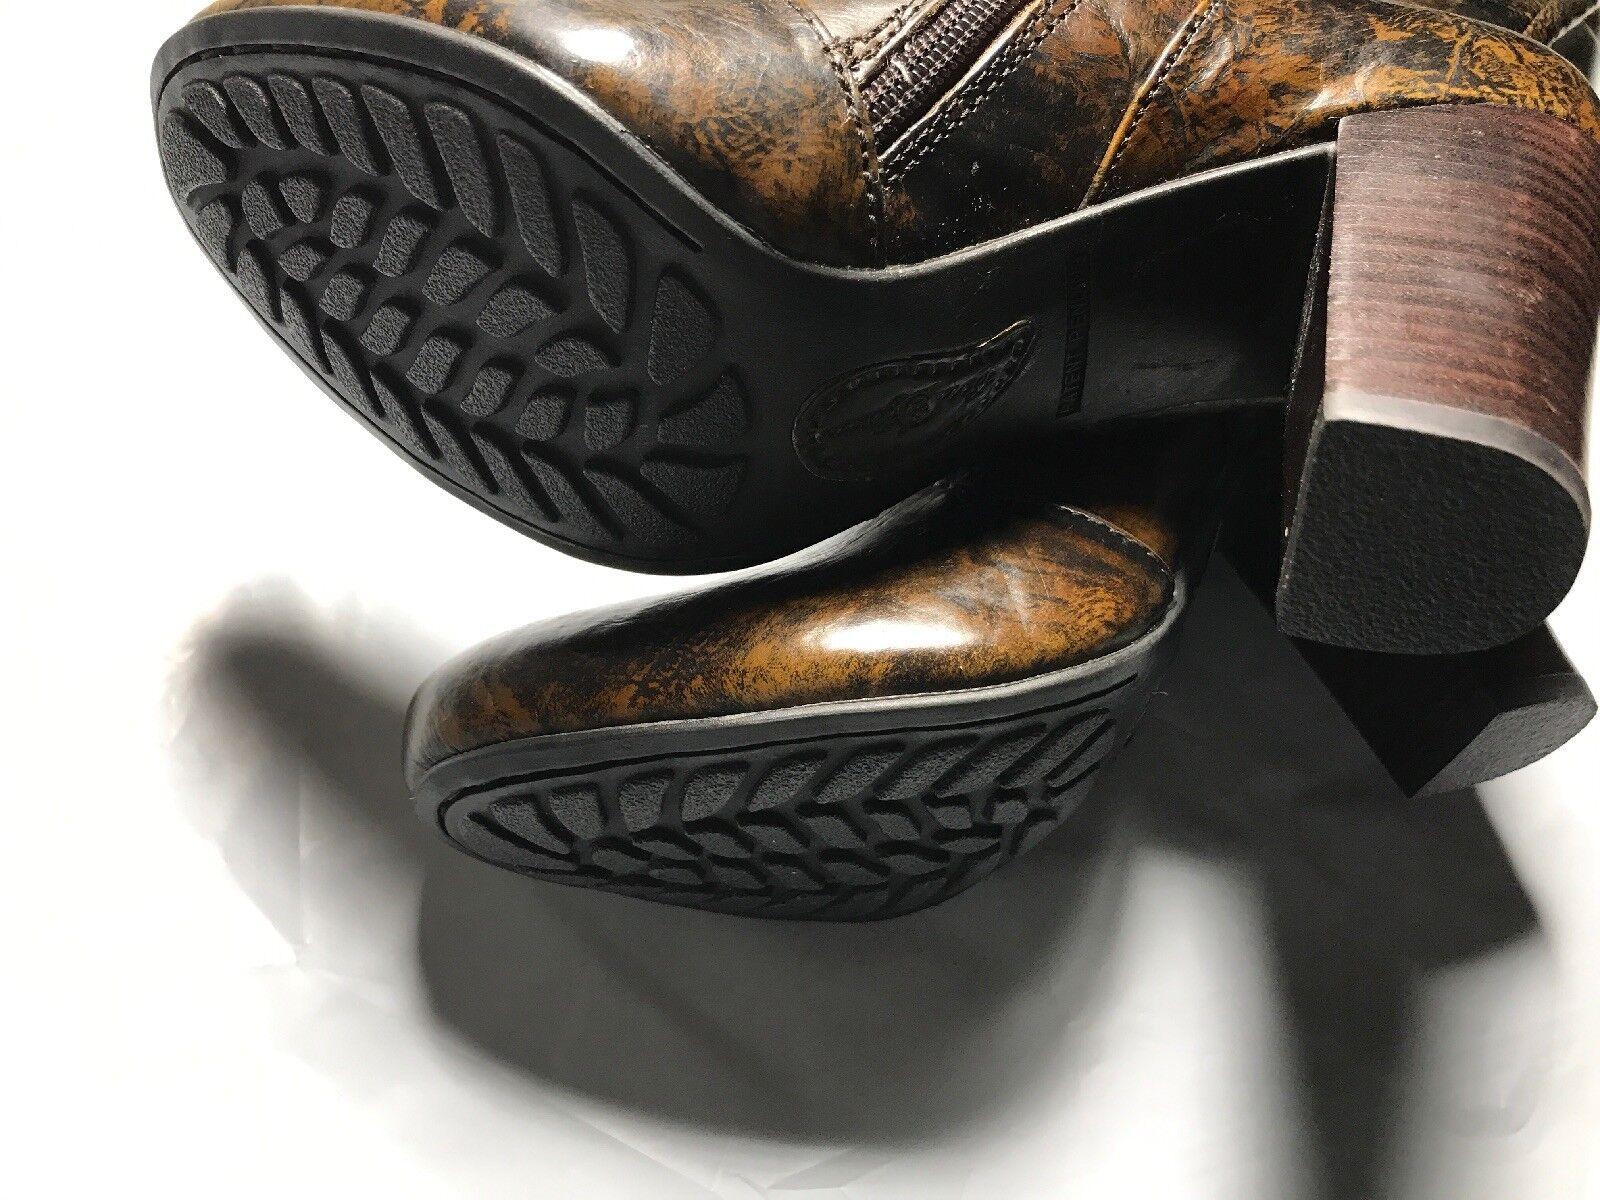 New Born Crown Lissa Tan Brush Off Leather damen damen damen Knee Stiefel  250 Größe 6 N01316 d28da1